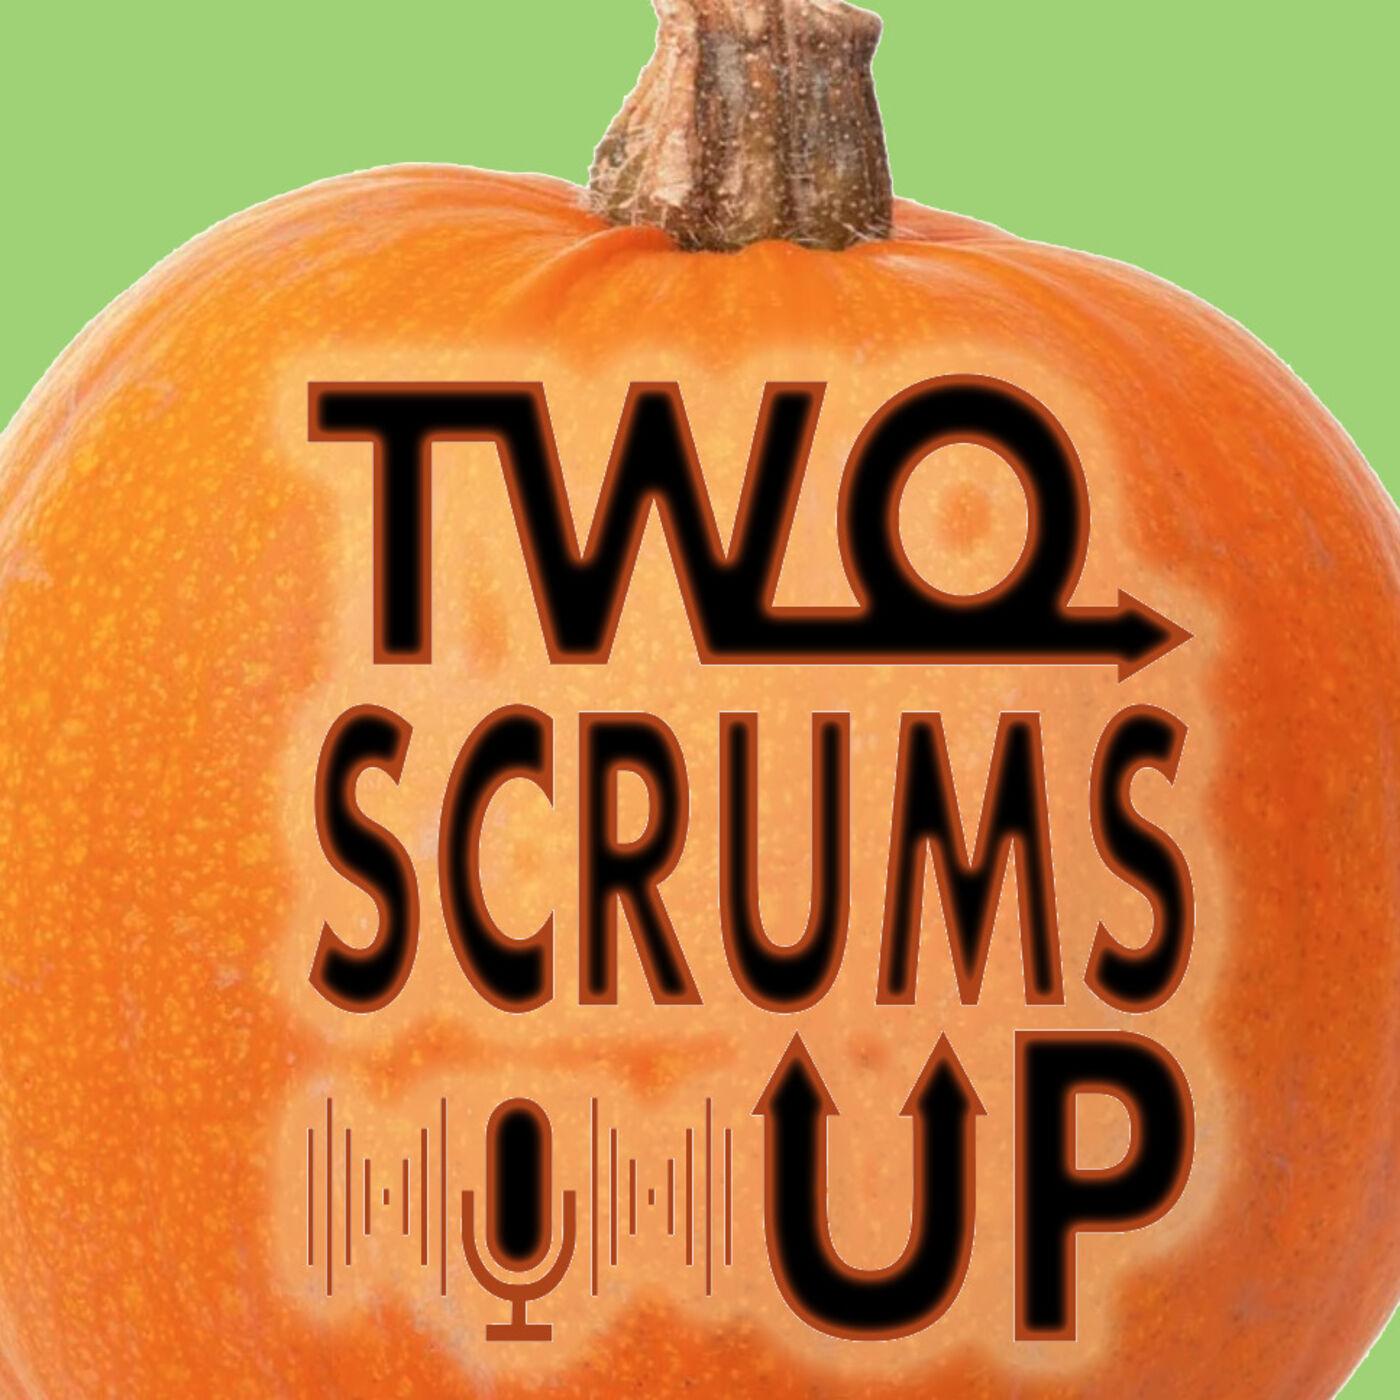 26. Spooky Scrum Stories